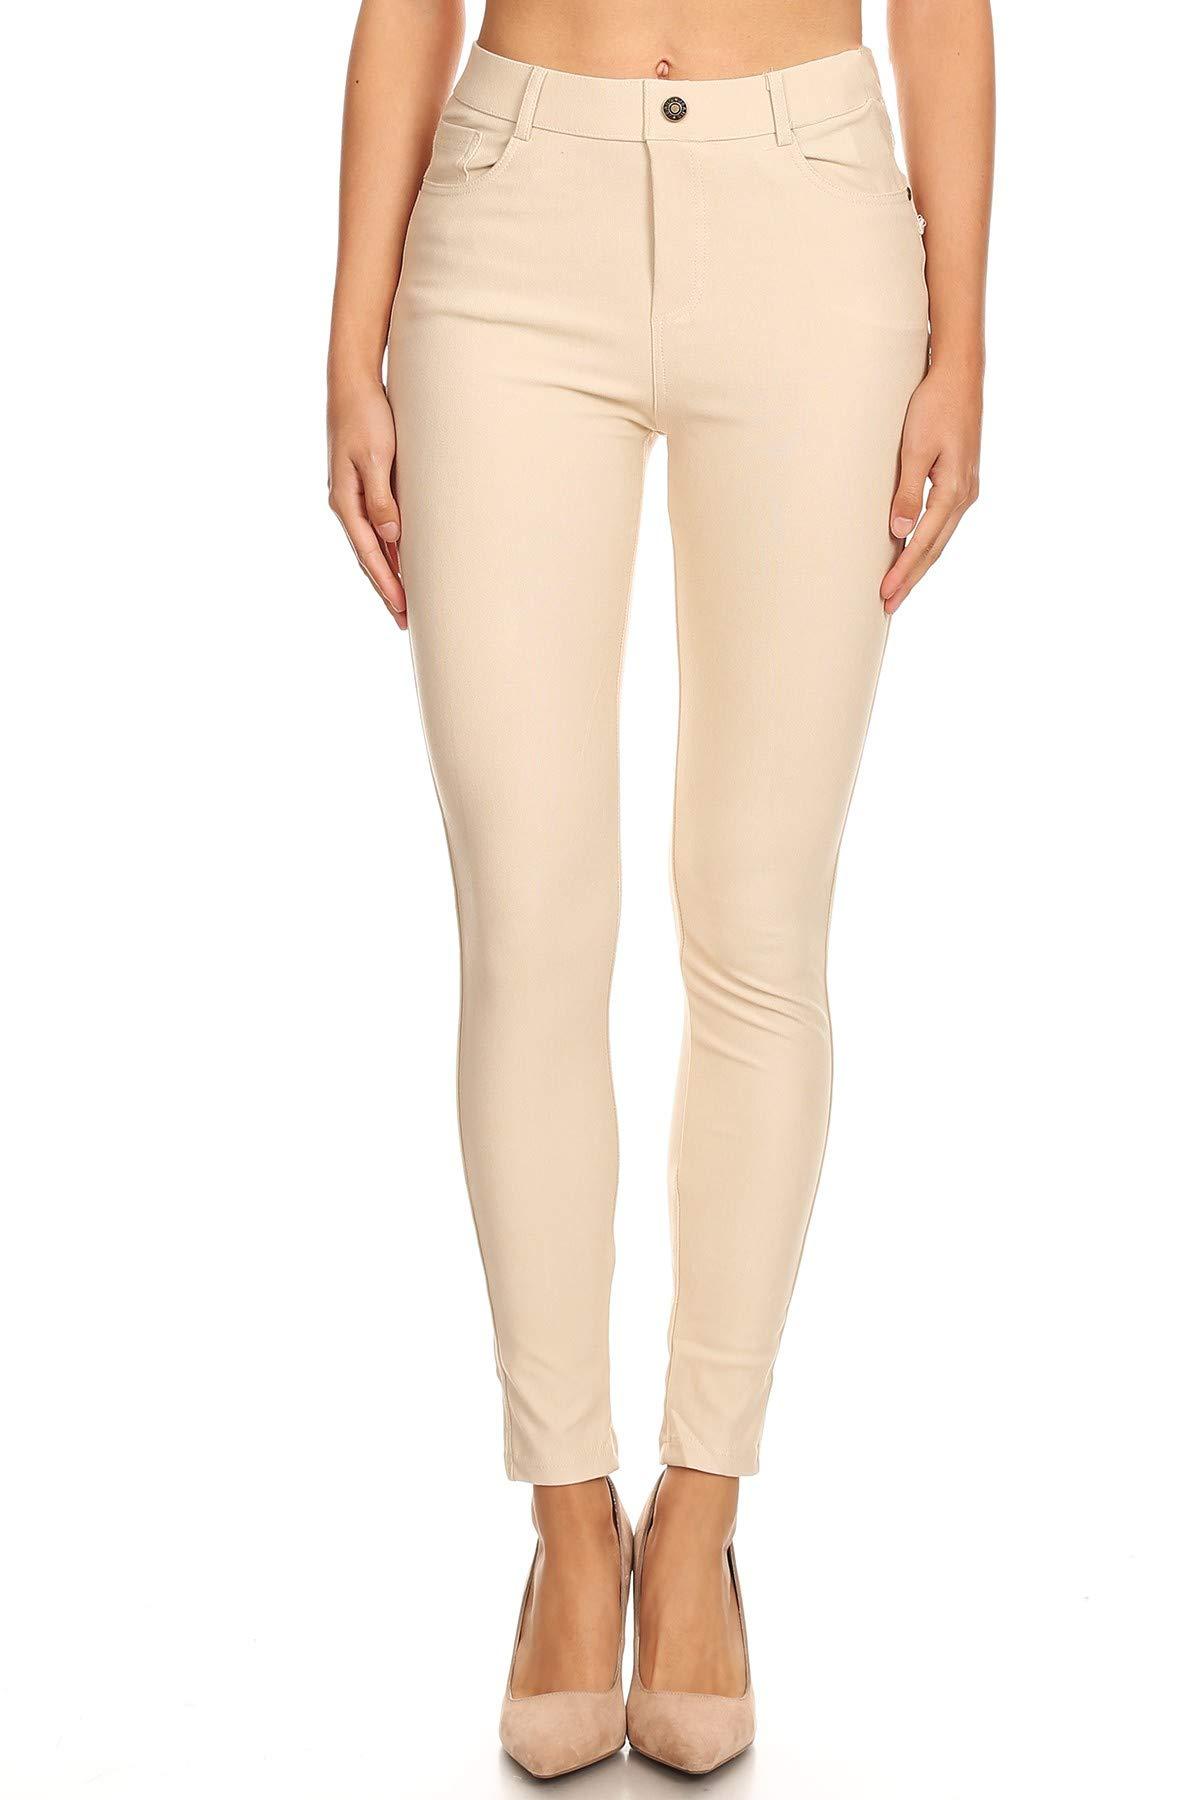 Jvini Women's Ultra Soft Pull-On Skinny Knit Denim Jean Leggings Khaki M